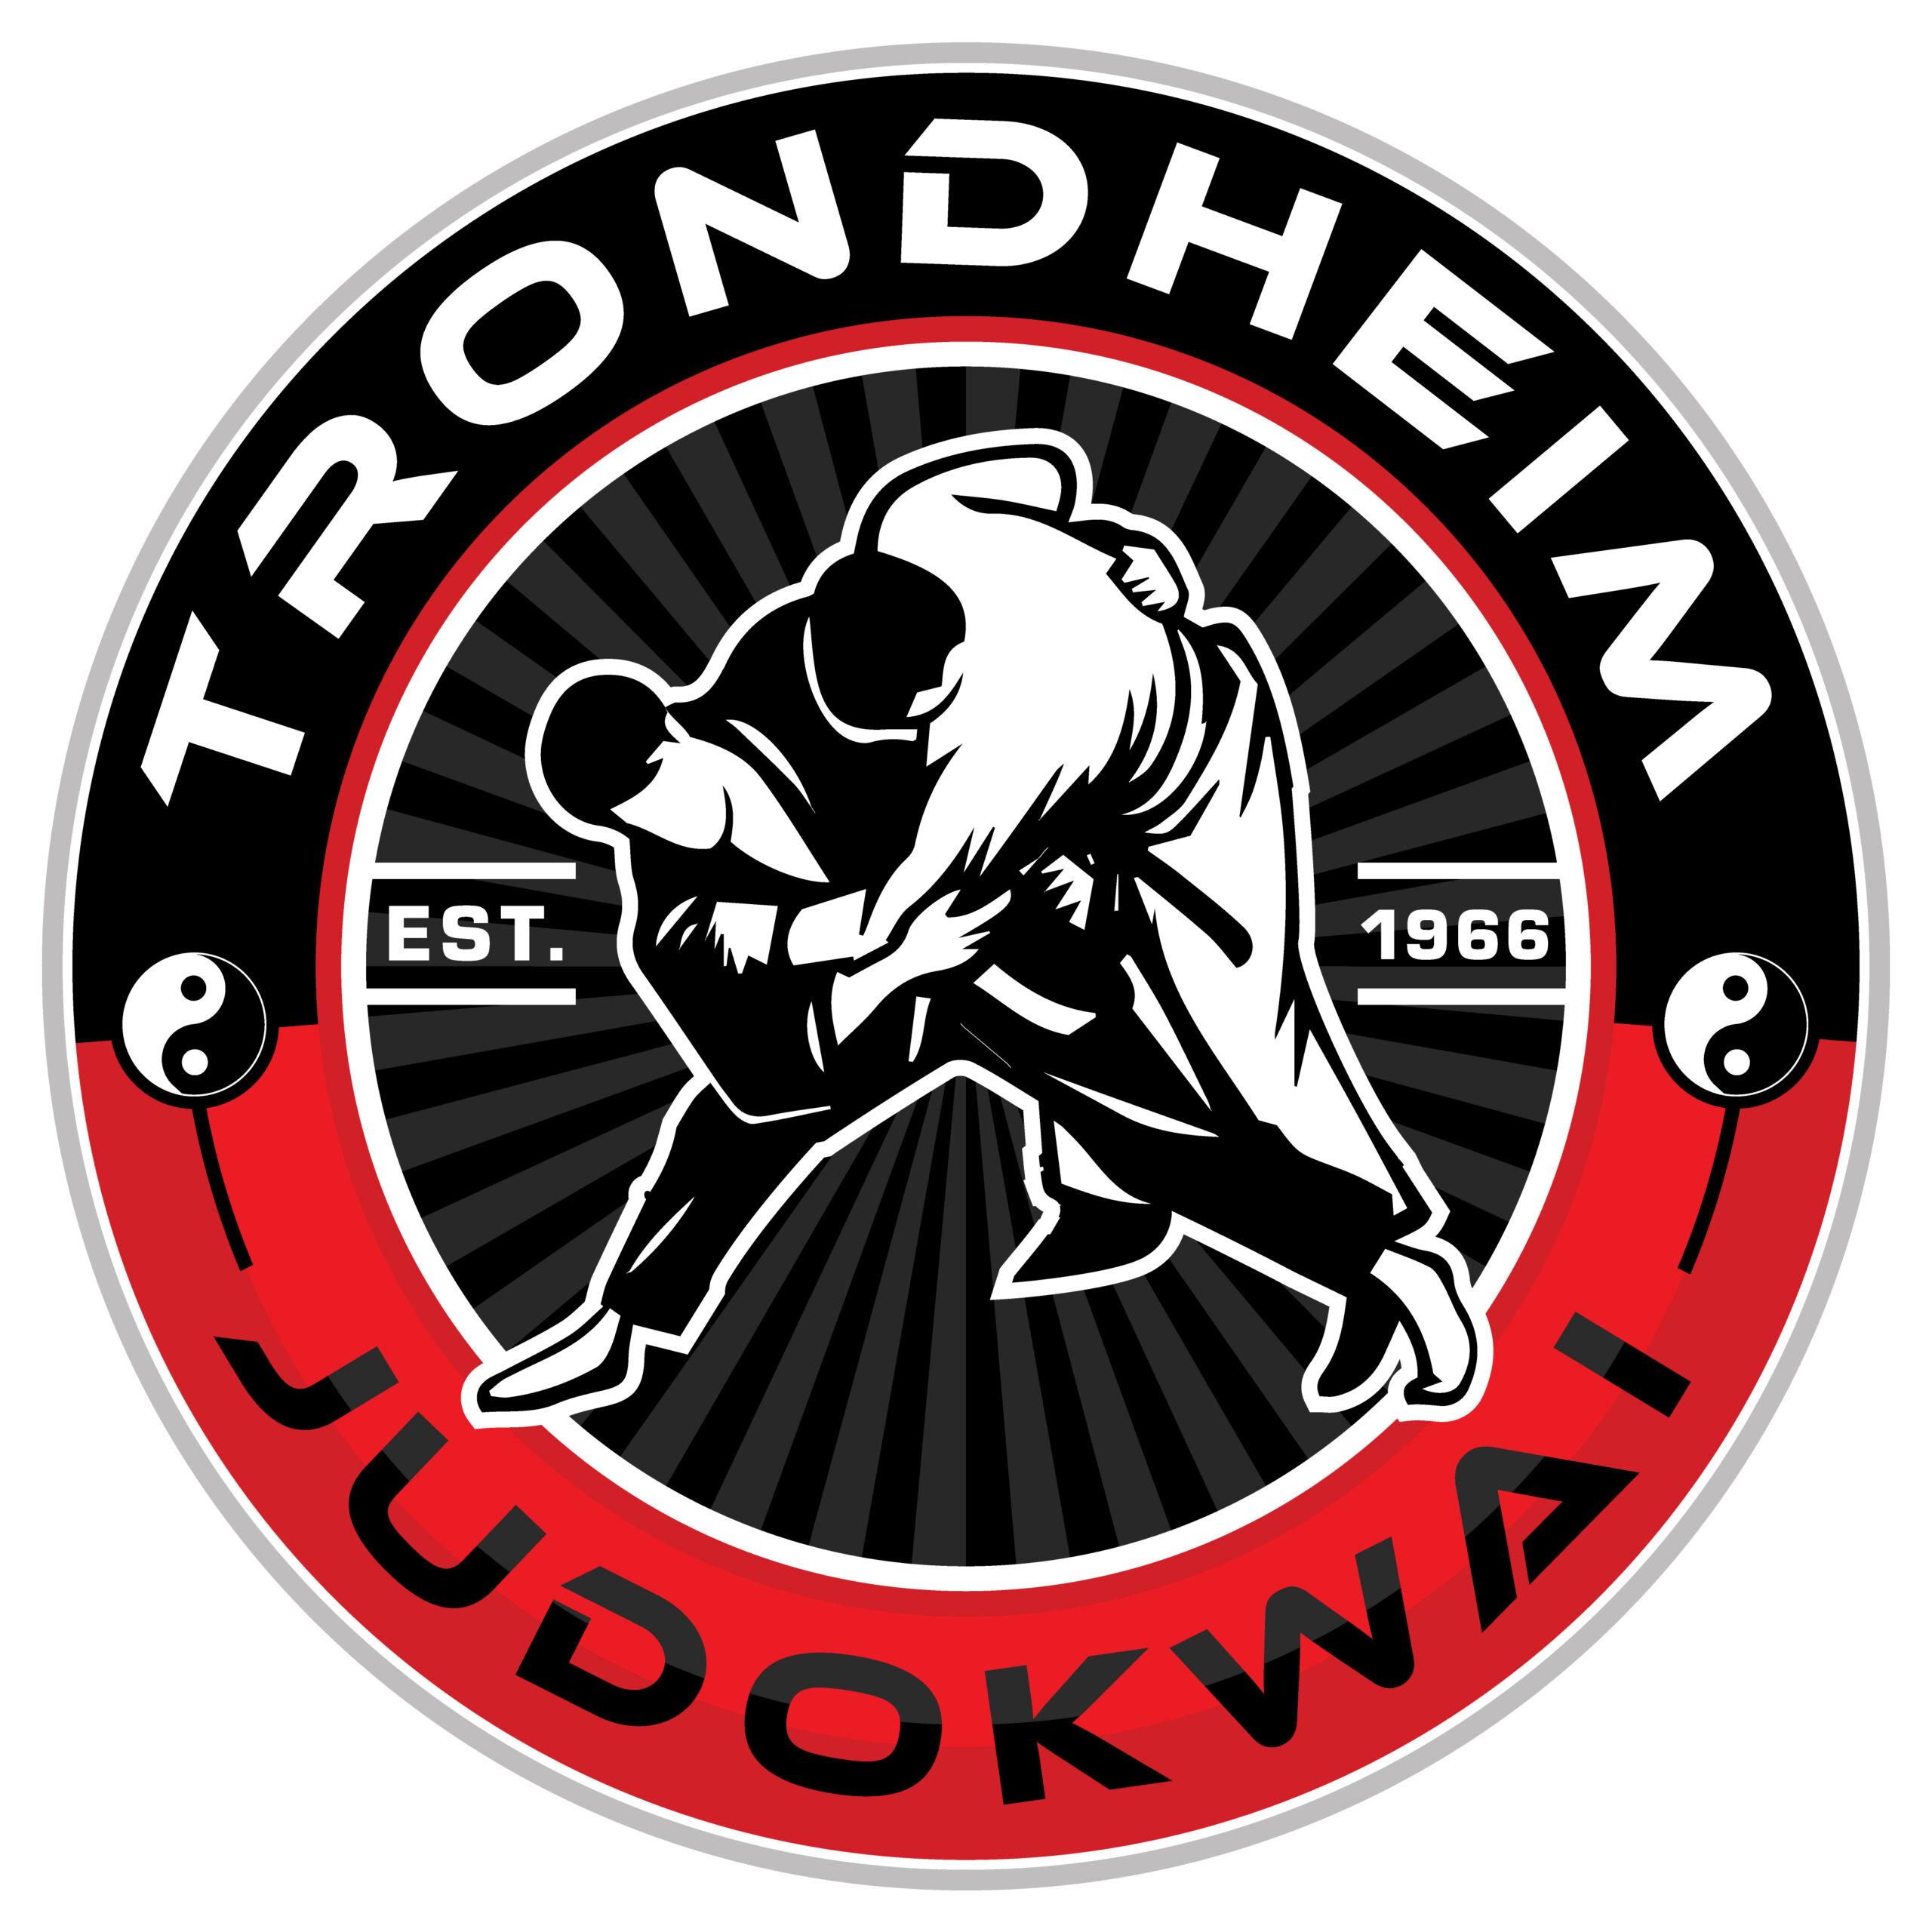 Trondheim Judokwai